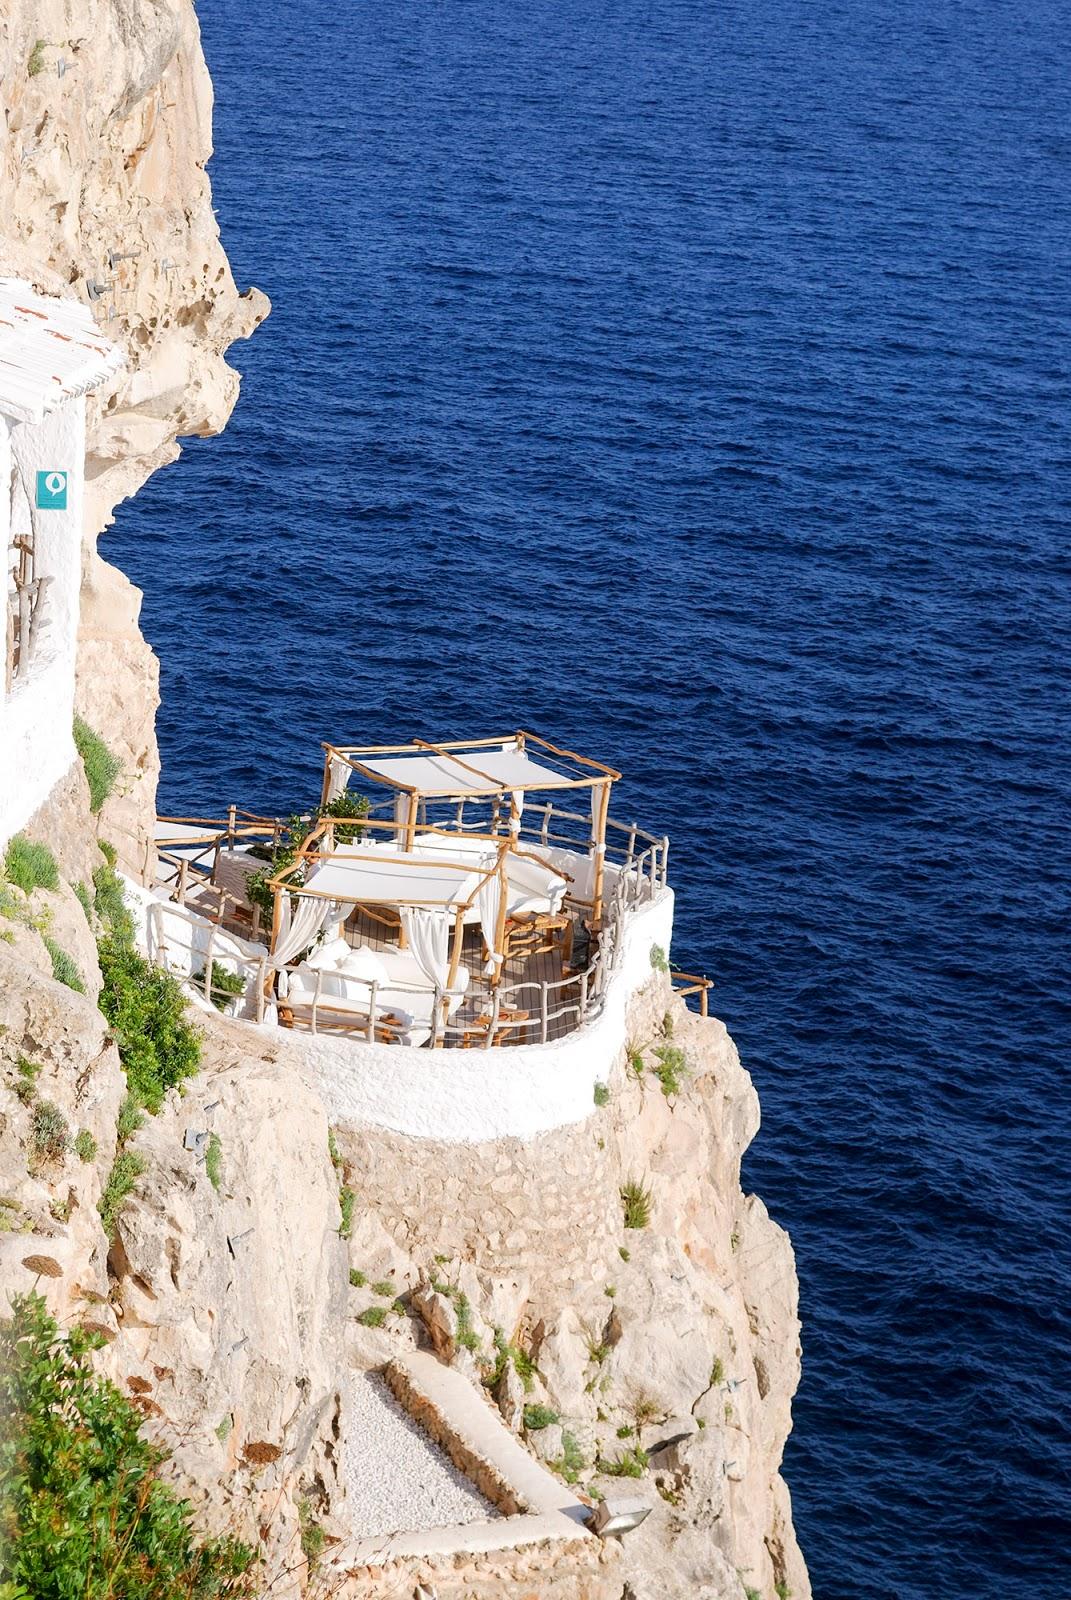 Cova d'en Xoroi Menorca Spain itinerary what to do